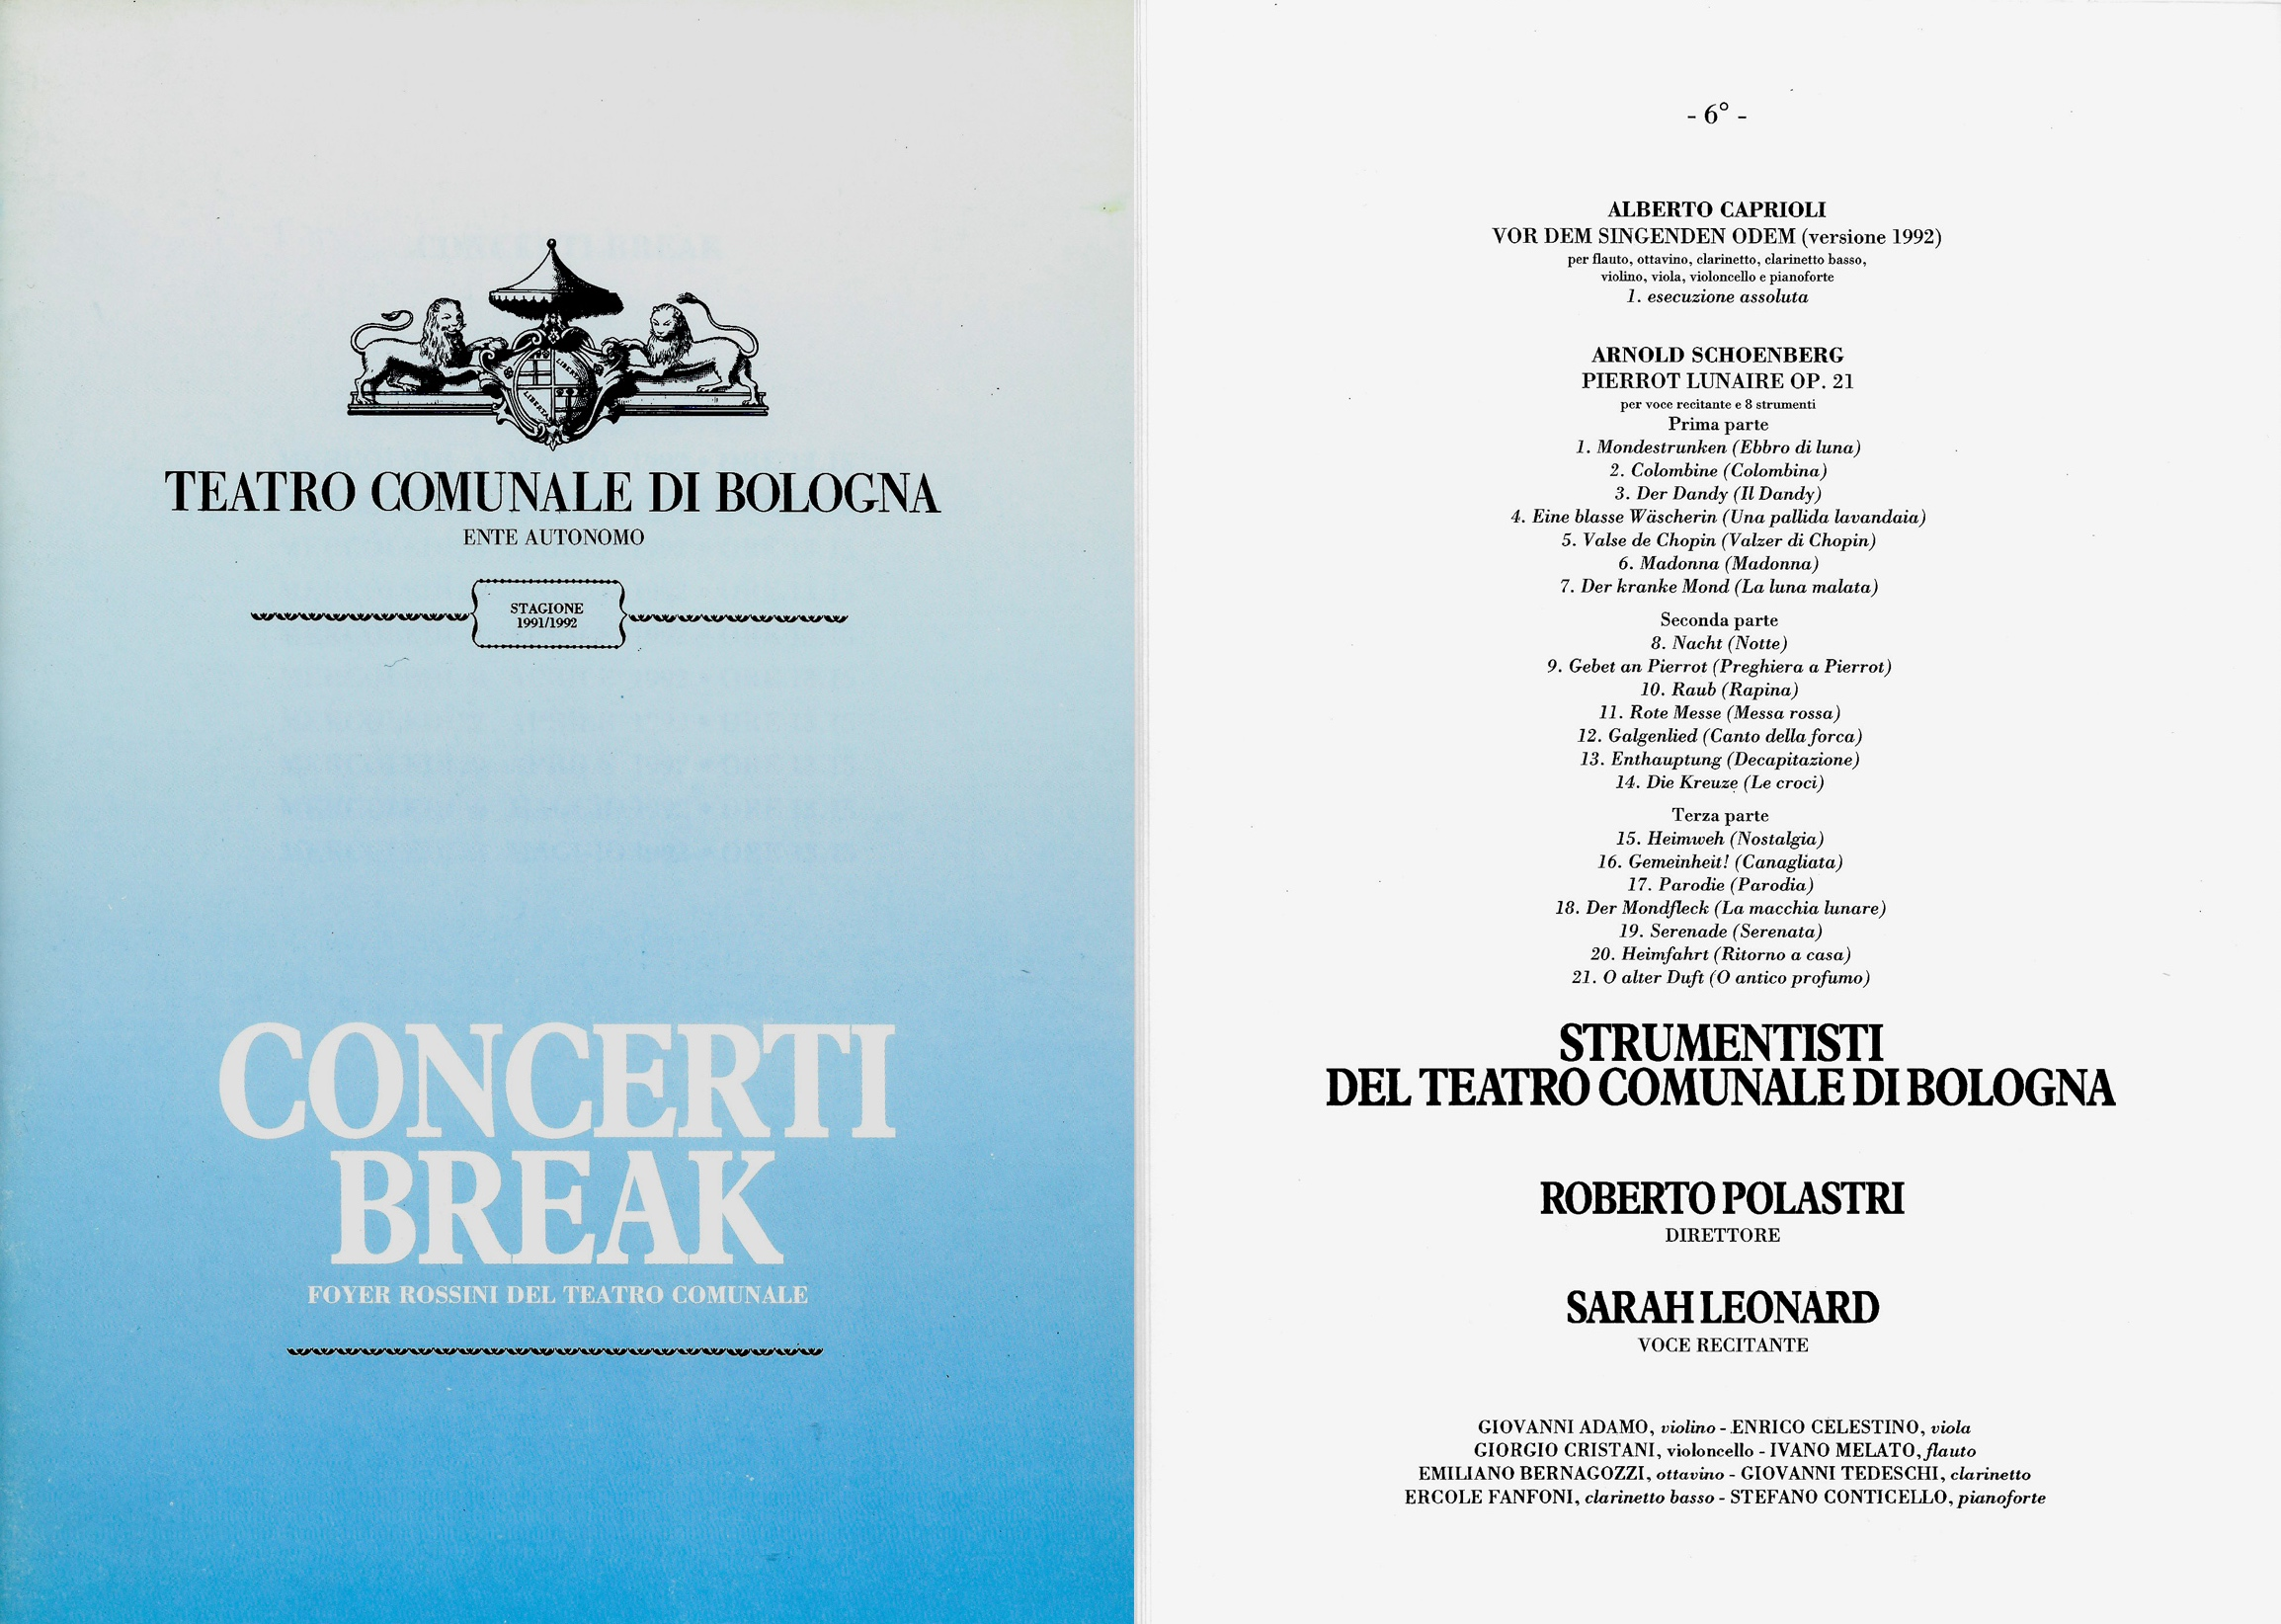 BOLOGNA, TEATRO COMUNALE, PRIMA ESECUZ. DI ALBERTO CAPRIOLI, VOR DEM SINGENDEN ODEM (VERS. 1992)